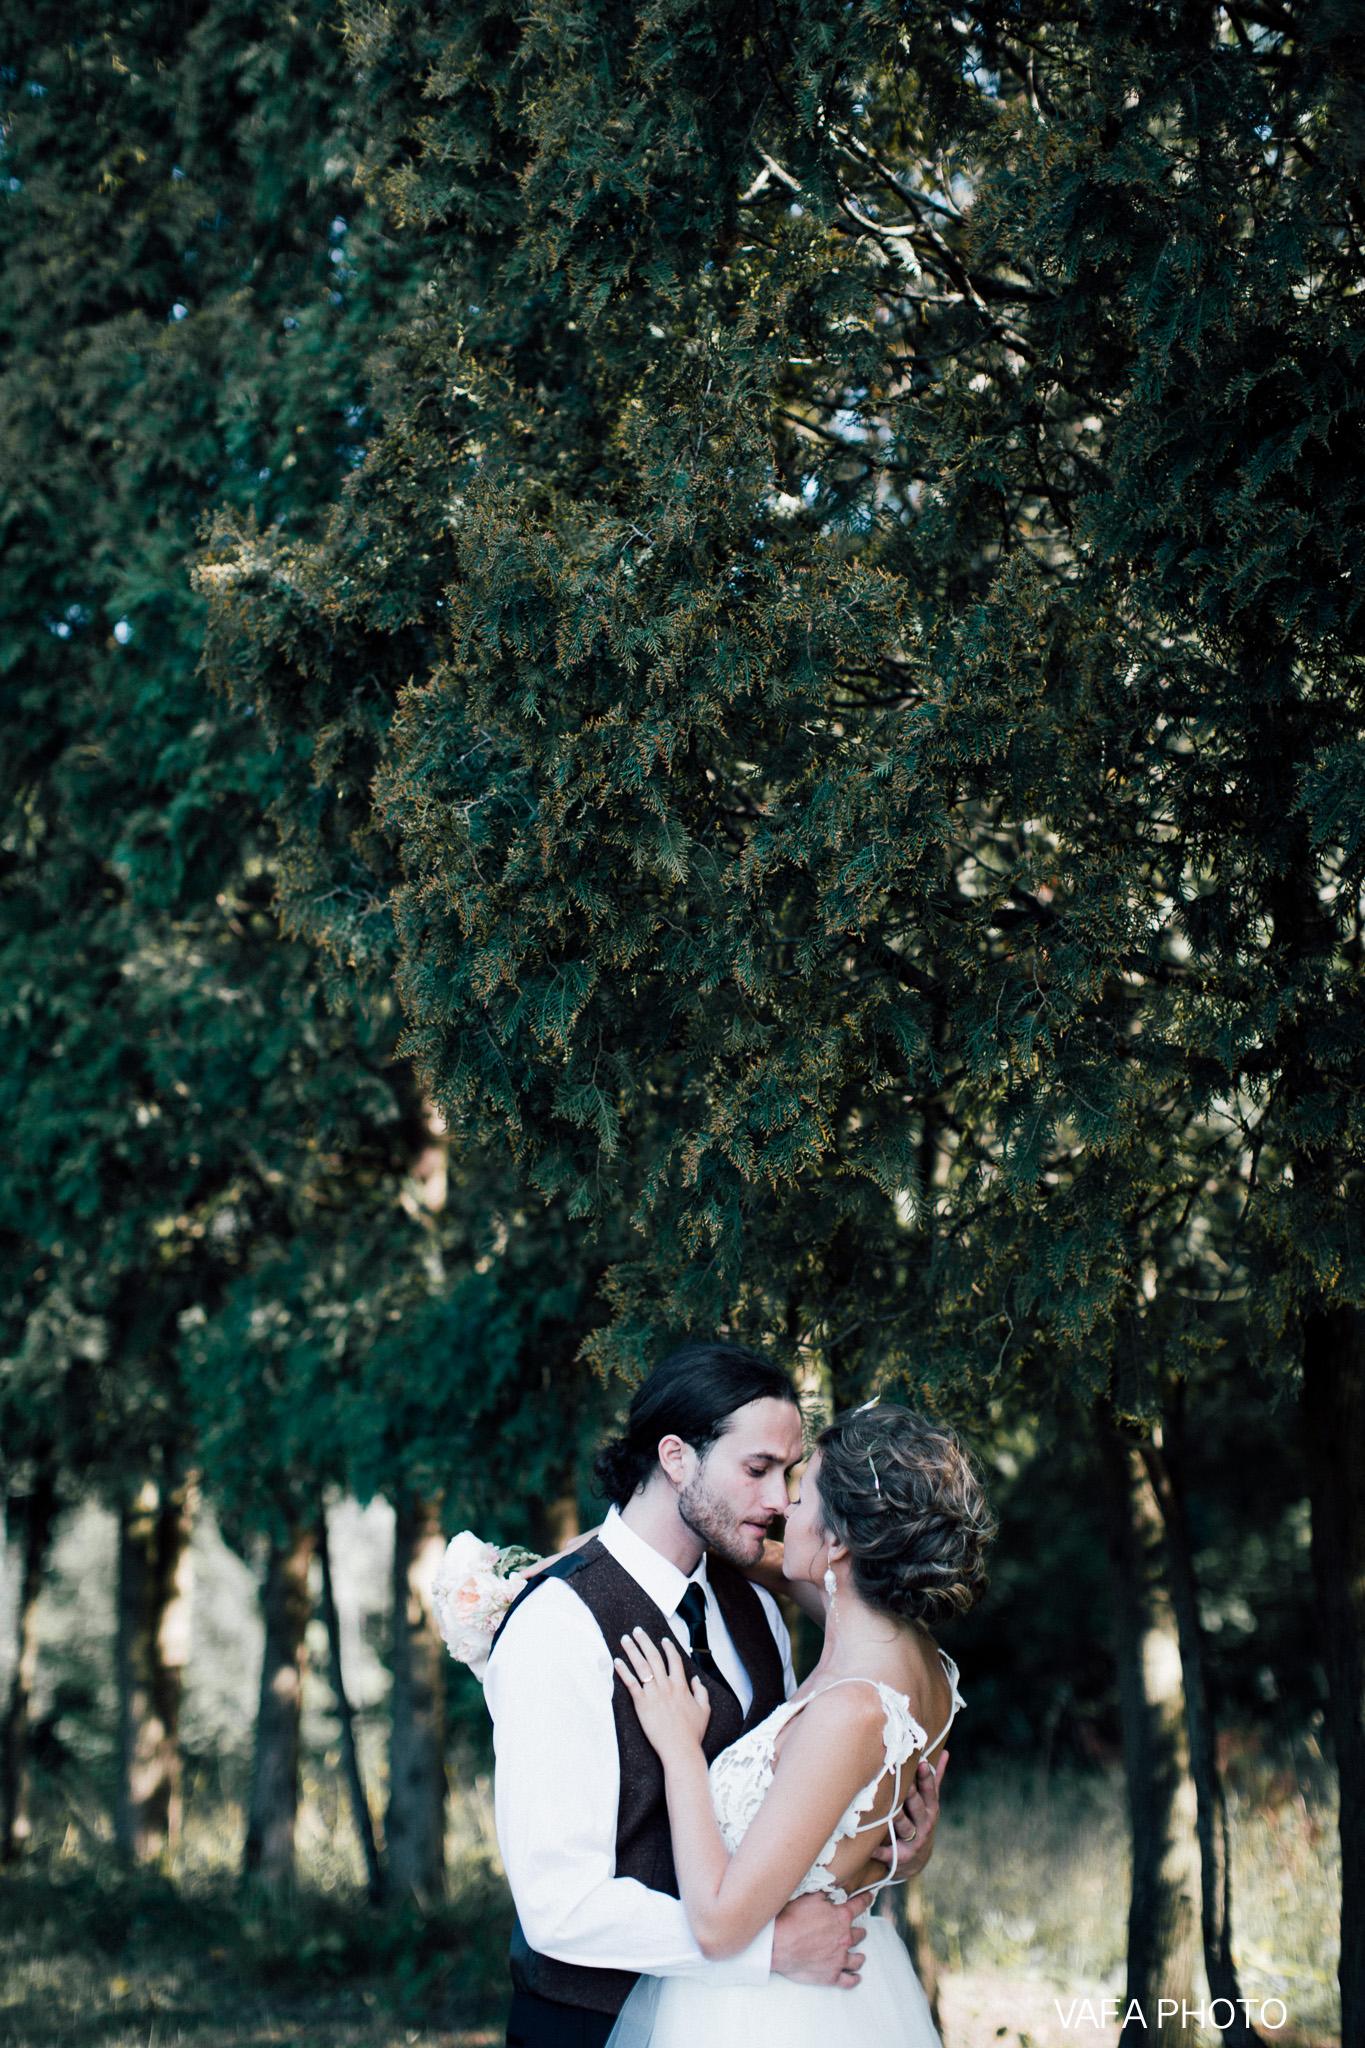 The-Felt-Estate-Wedding-Kailie-David-Vafa-Photo-644.jpg